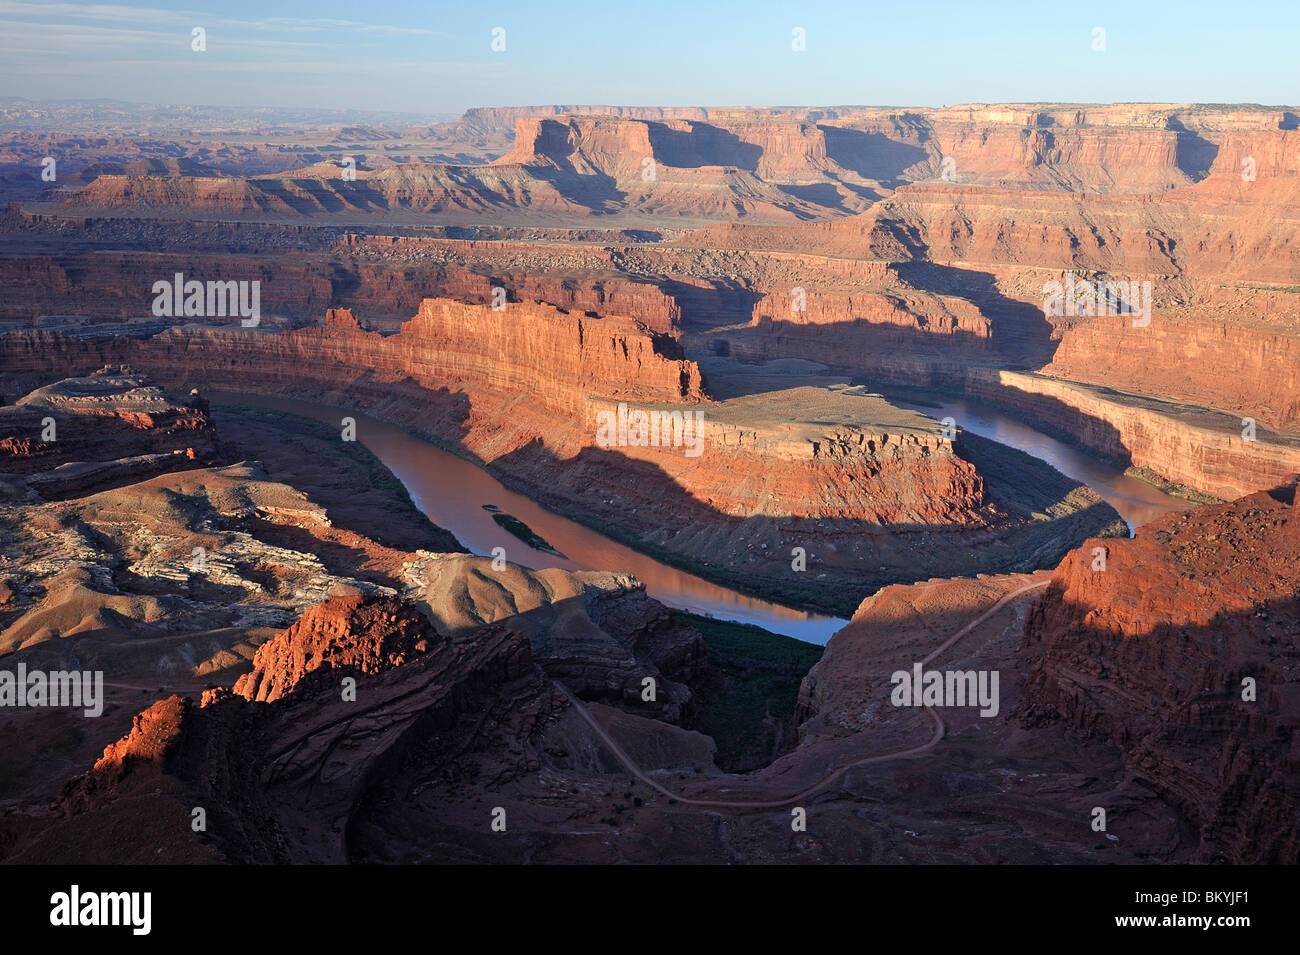 Dead Horse Point State Park - Sunrise, Moab, Utah, Stati Uniti d'America Foto Stock